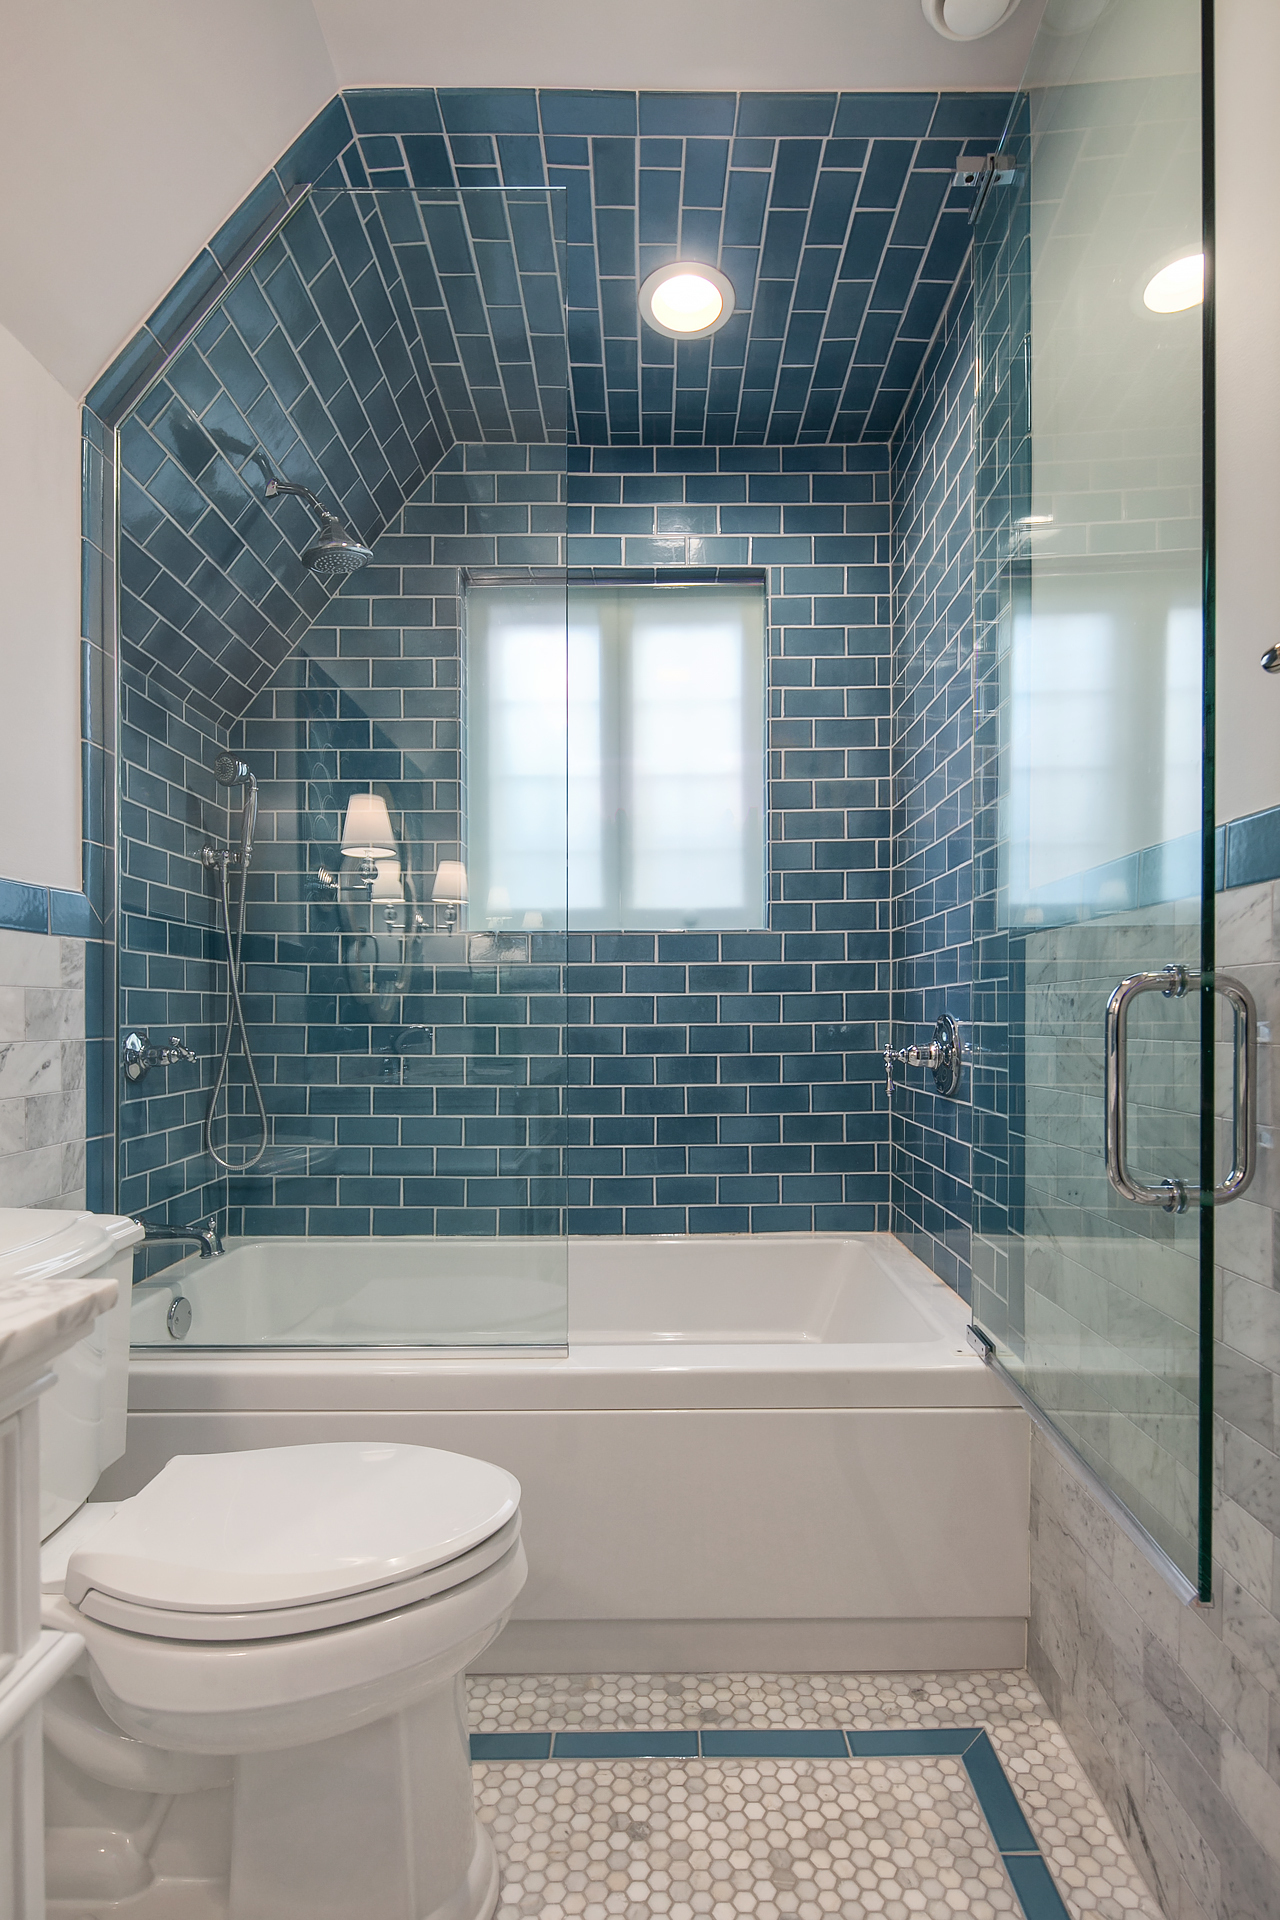 bathroom wall tiles how high should